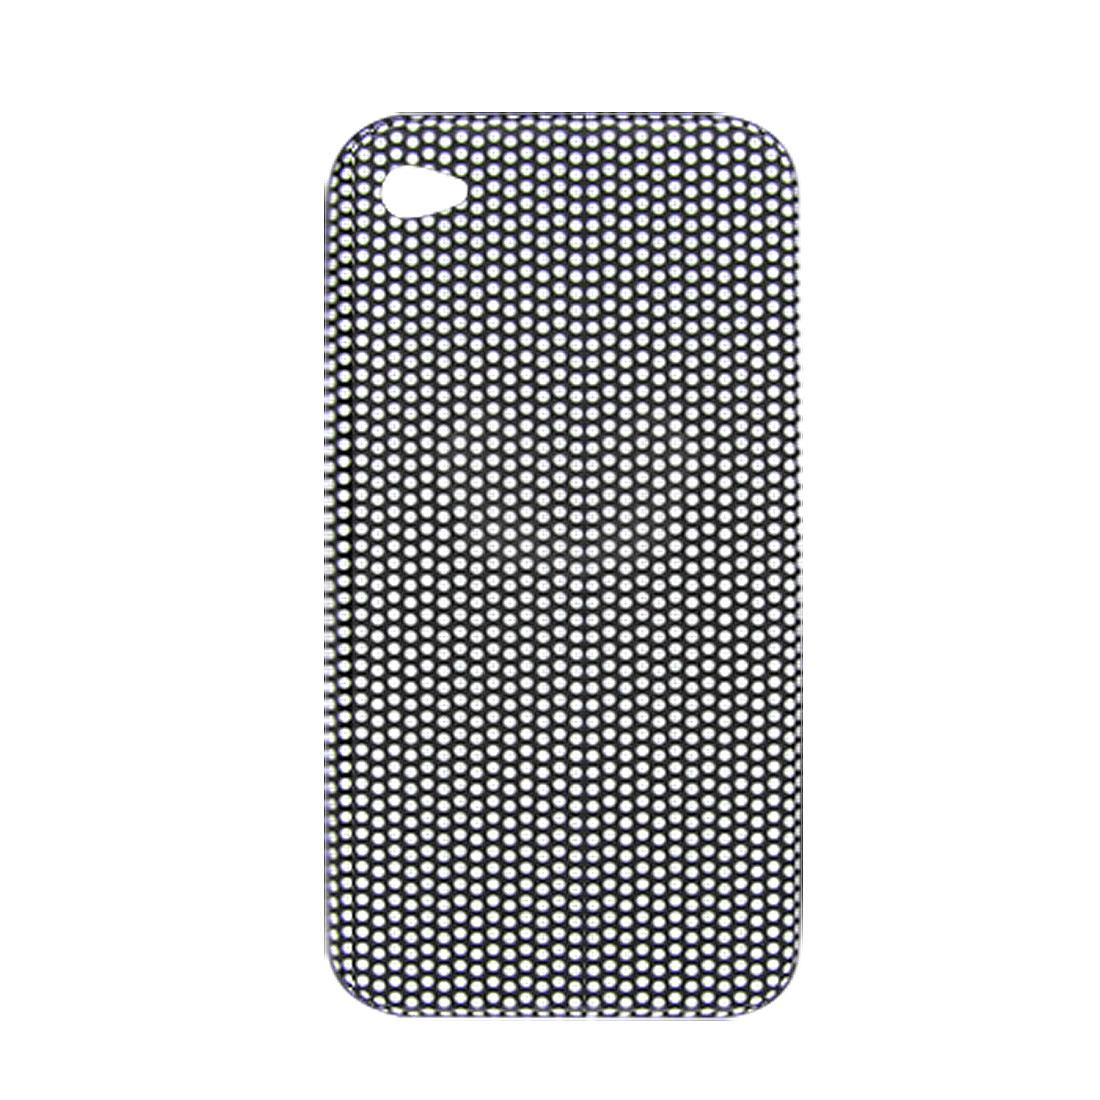 Hard Plastic White Dot Pattern Black Back Cover for iPhone4